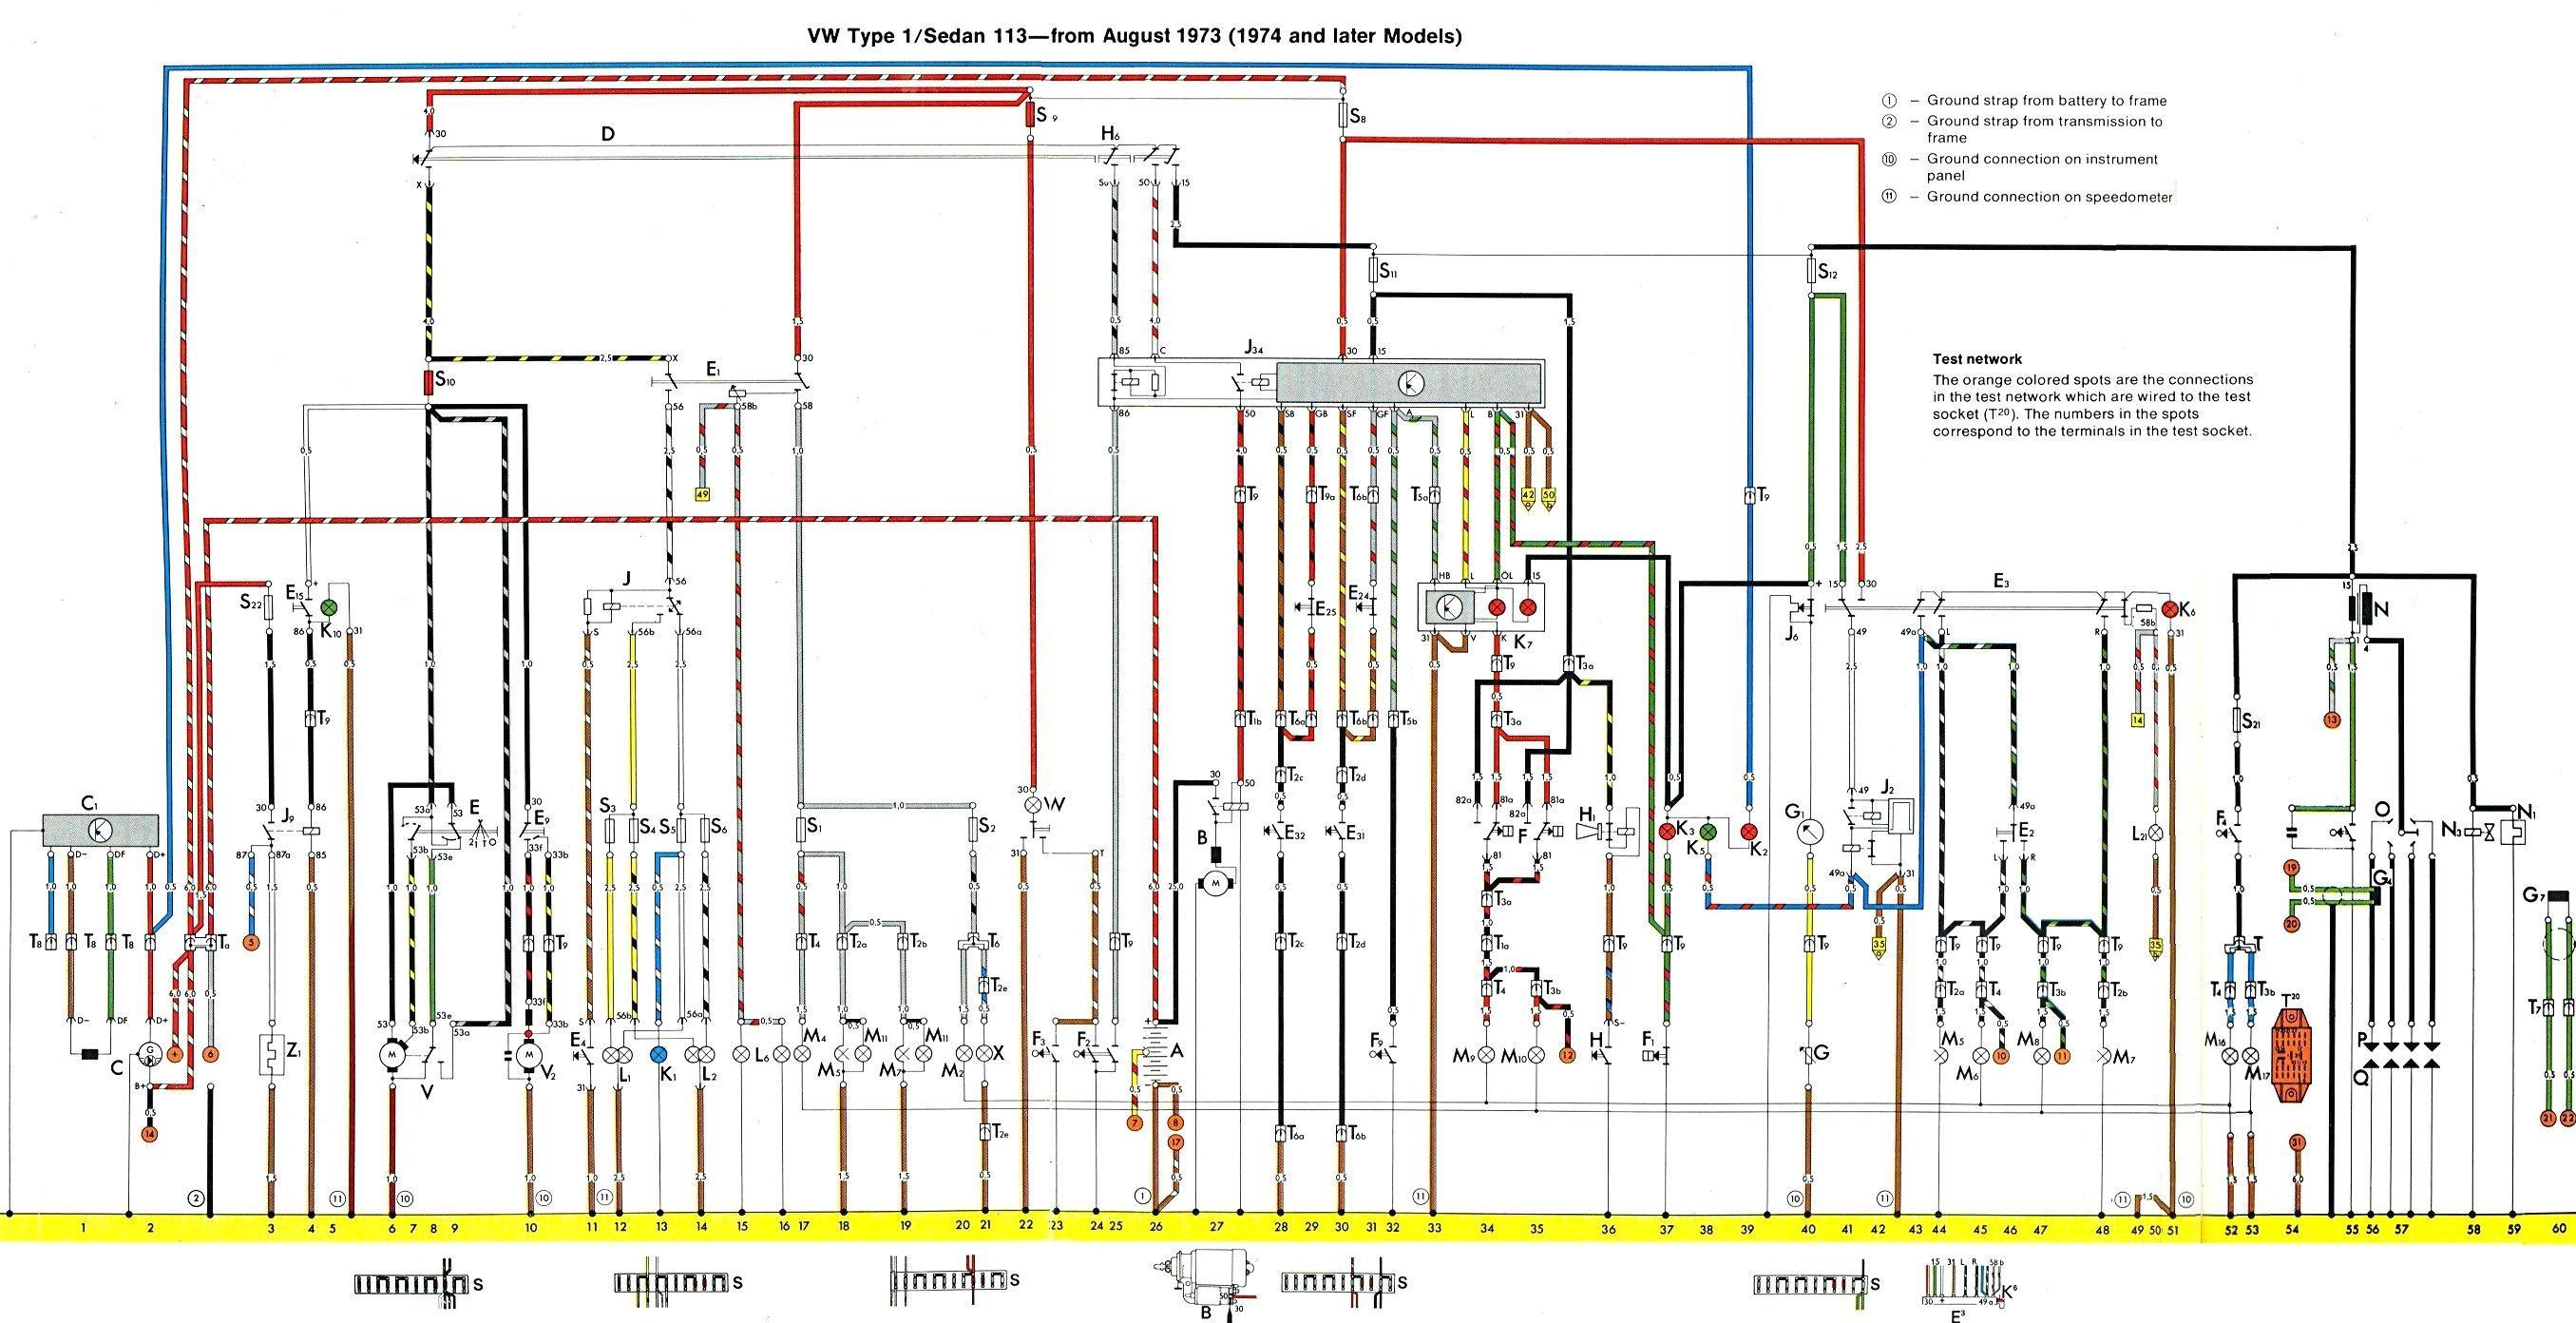 2000 Vw Jetta Fuse Diagram Http Wwwpic2flycom 2000volkswagen ... New Beetle Transmission Wiring Diagram on